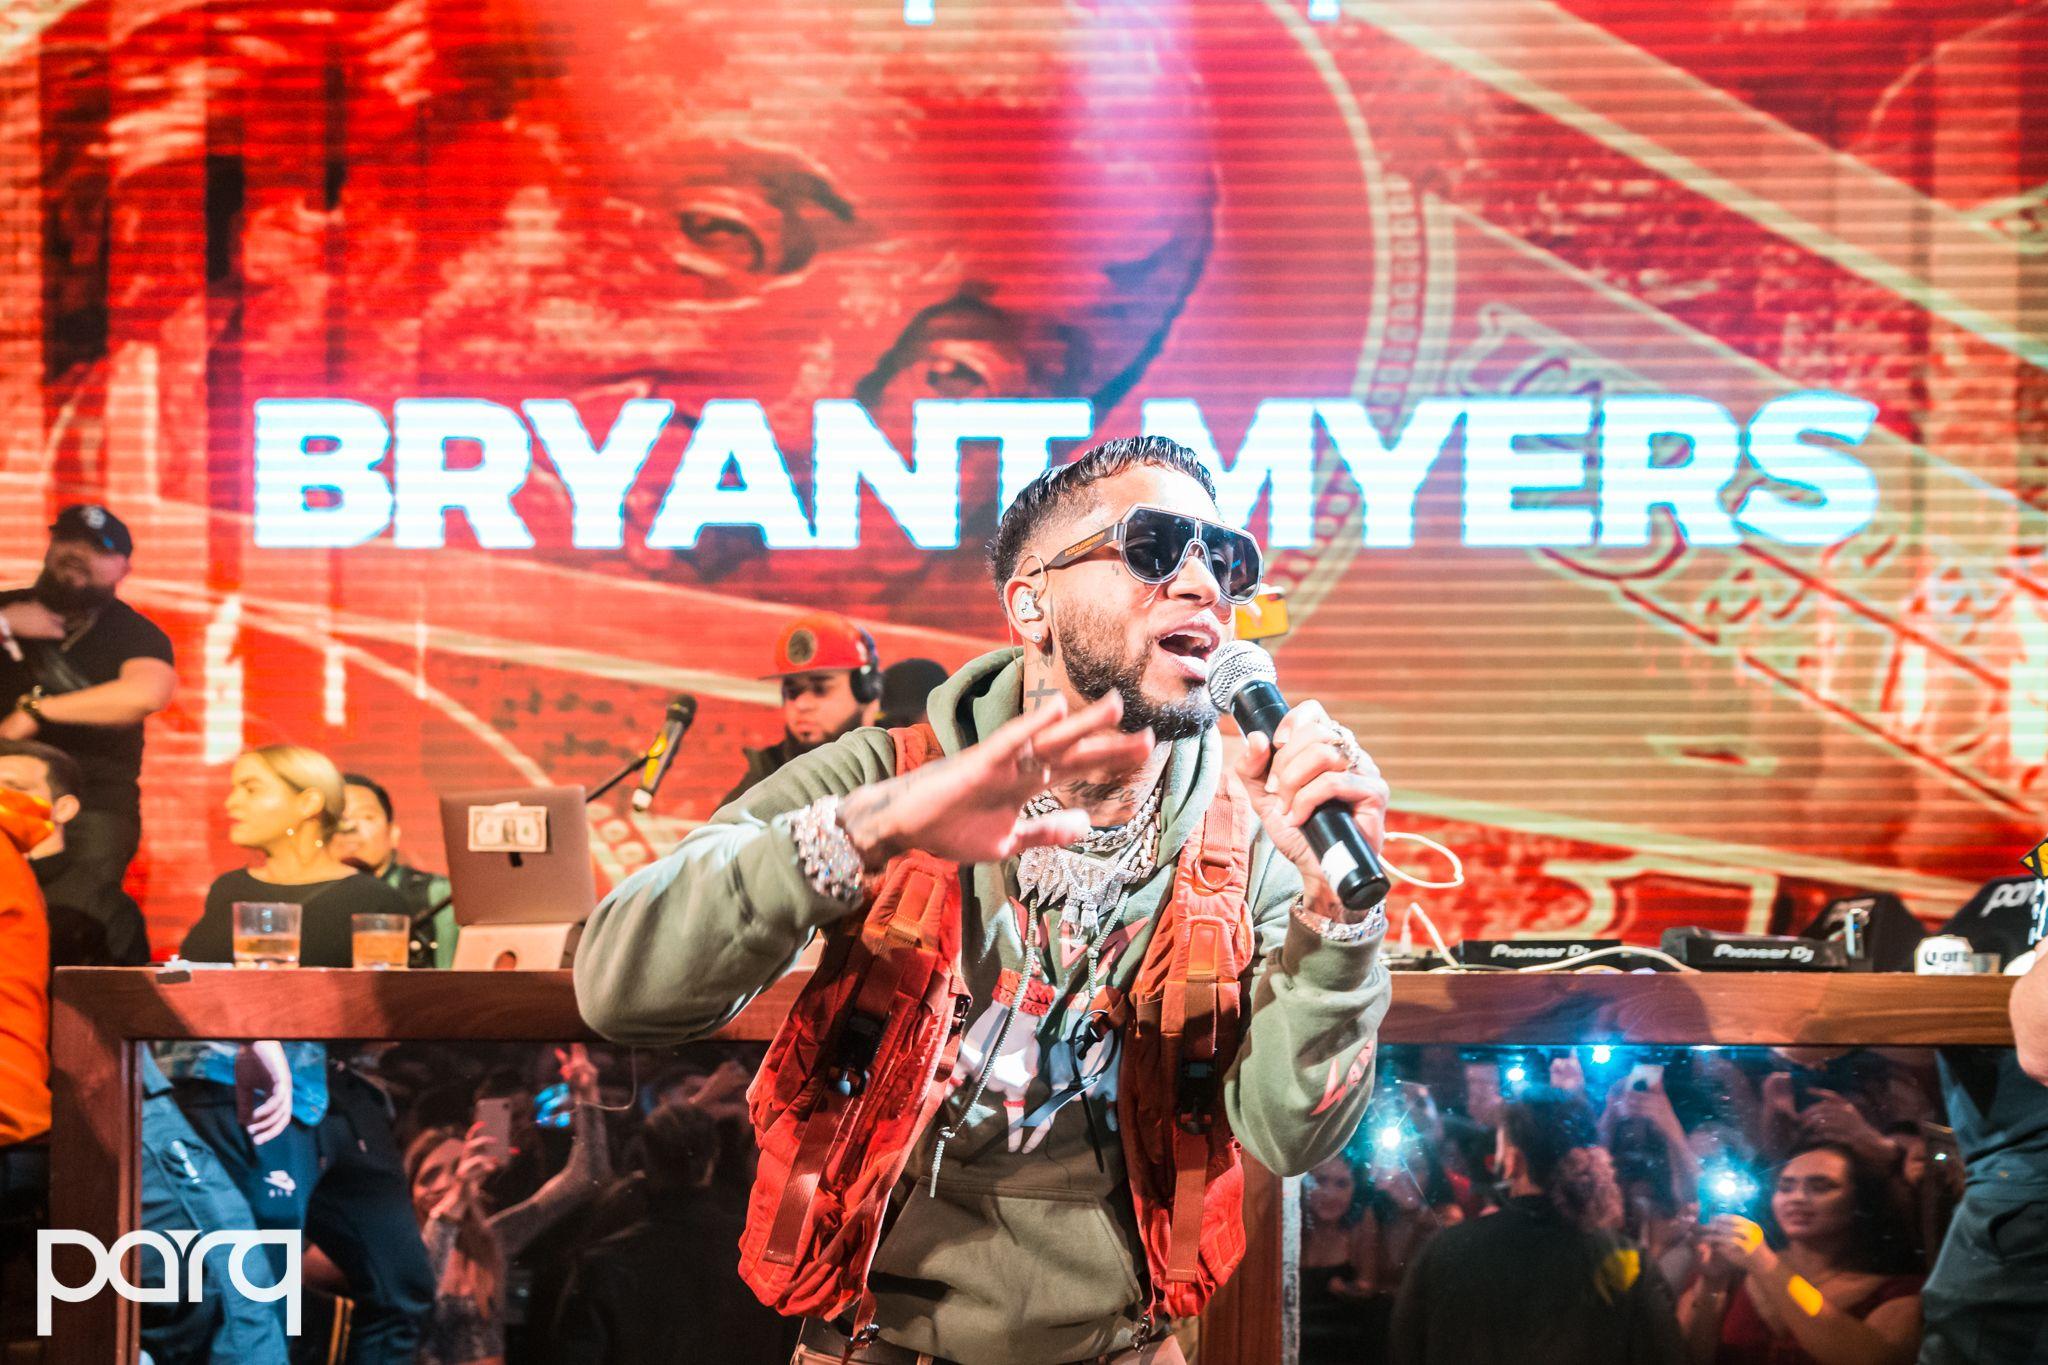 12.13.19 Parq - Bryant Myers-13.jpg